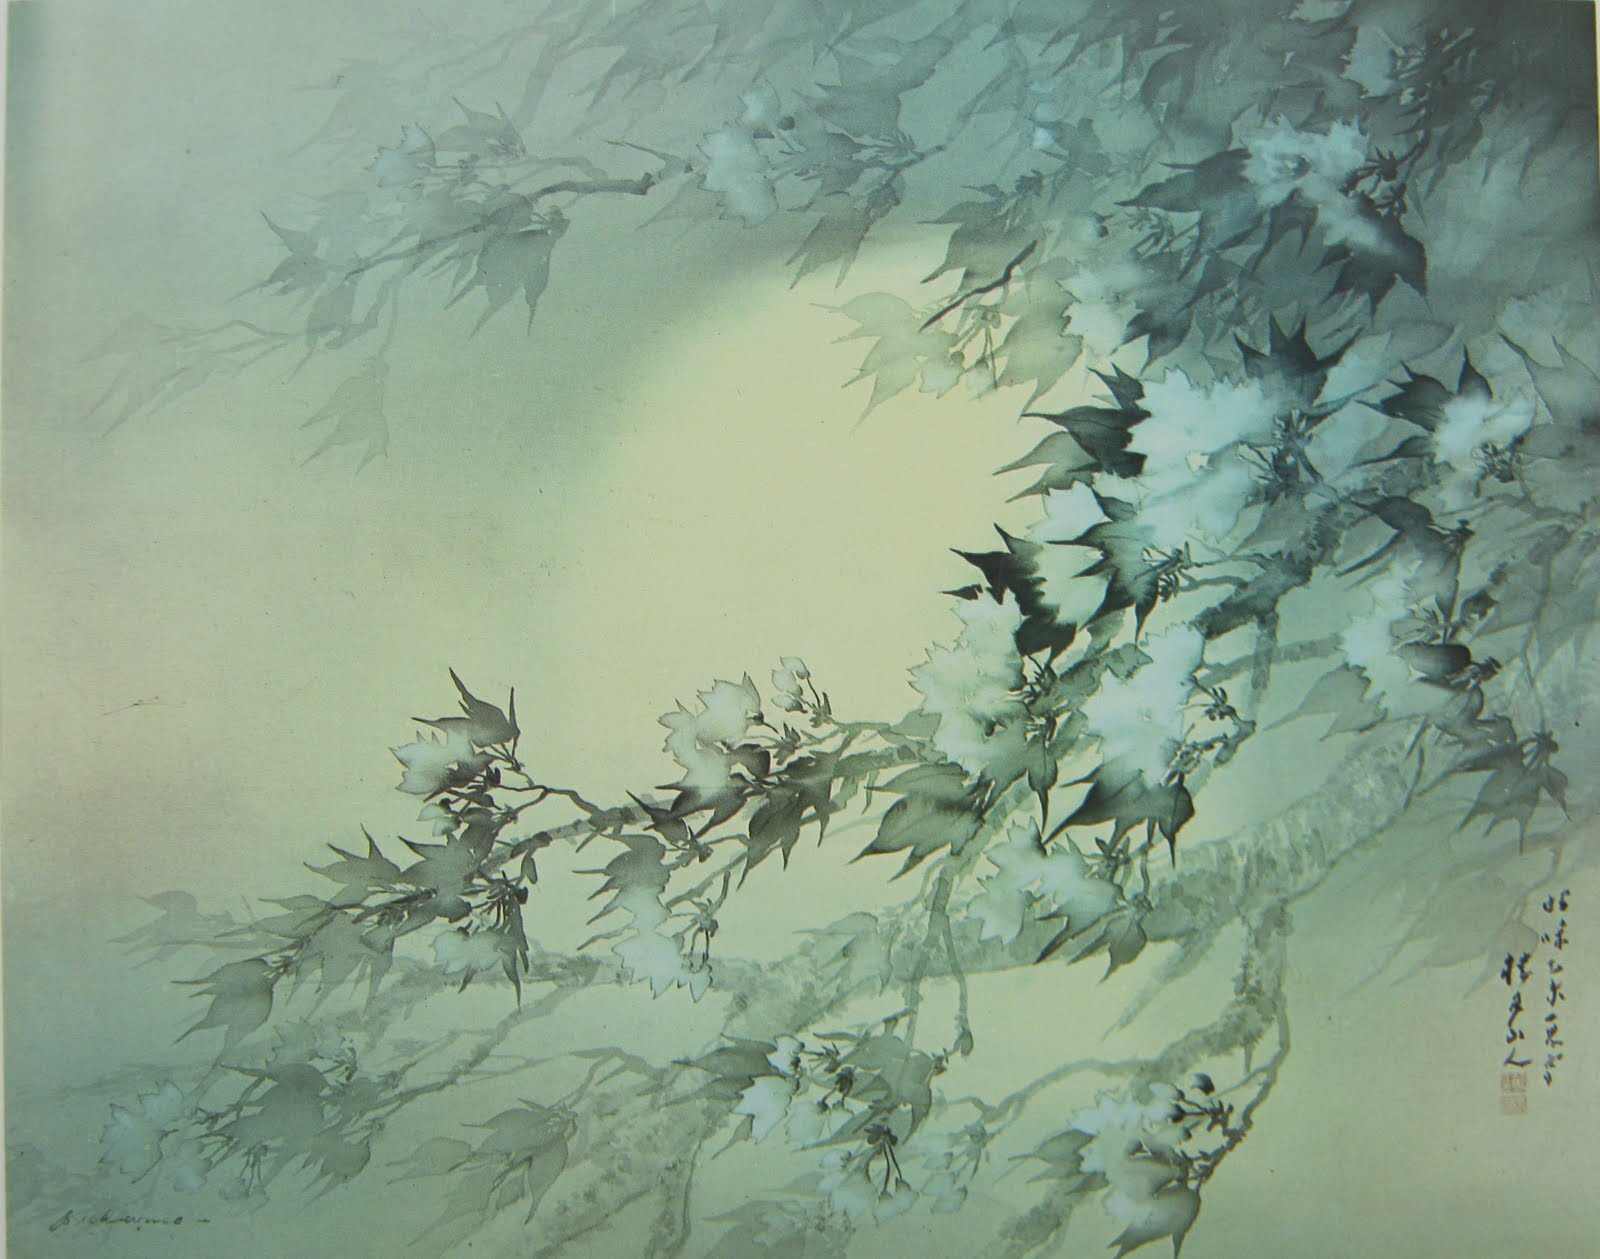 Kumpulan Gambar Sketsa Alam Benda Penuang Air Yang Mudah Dan